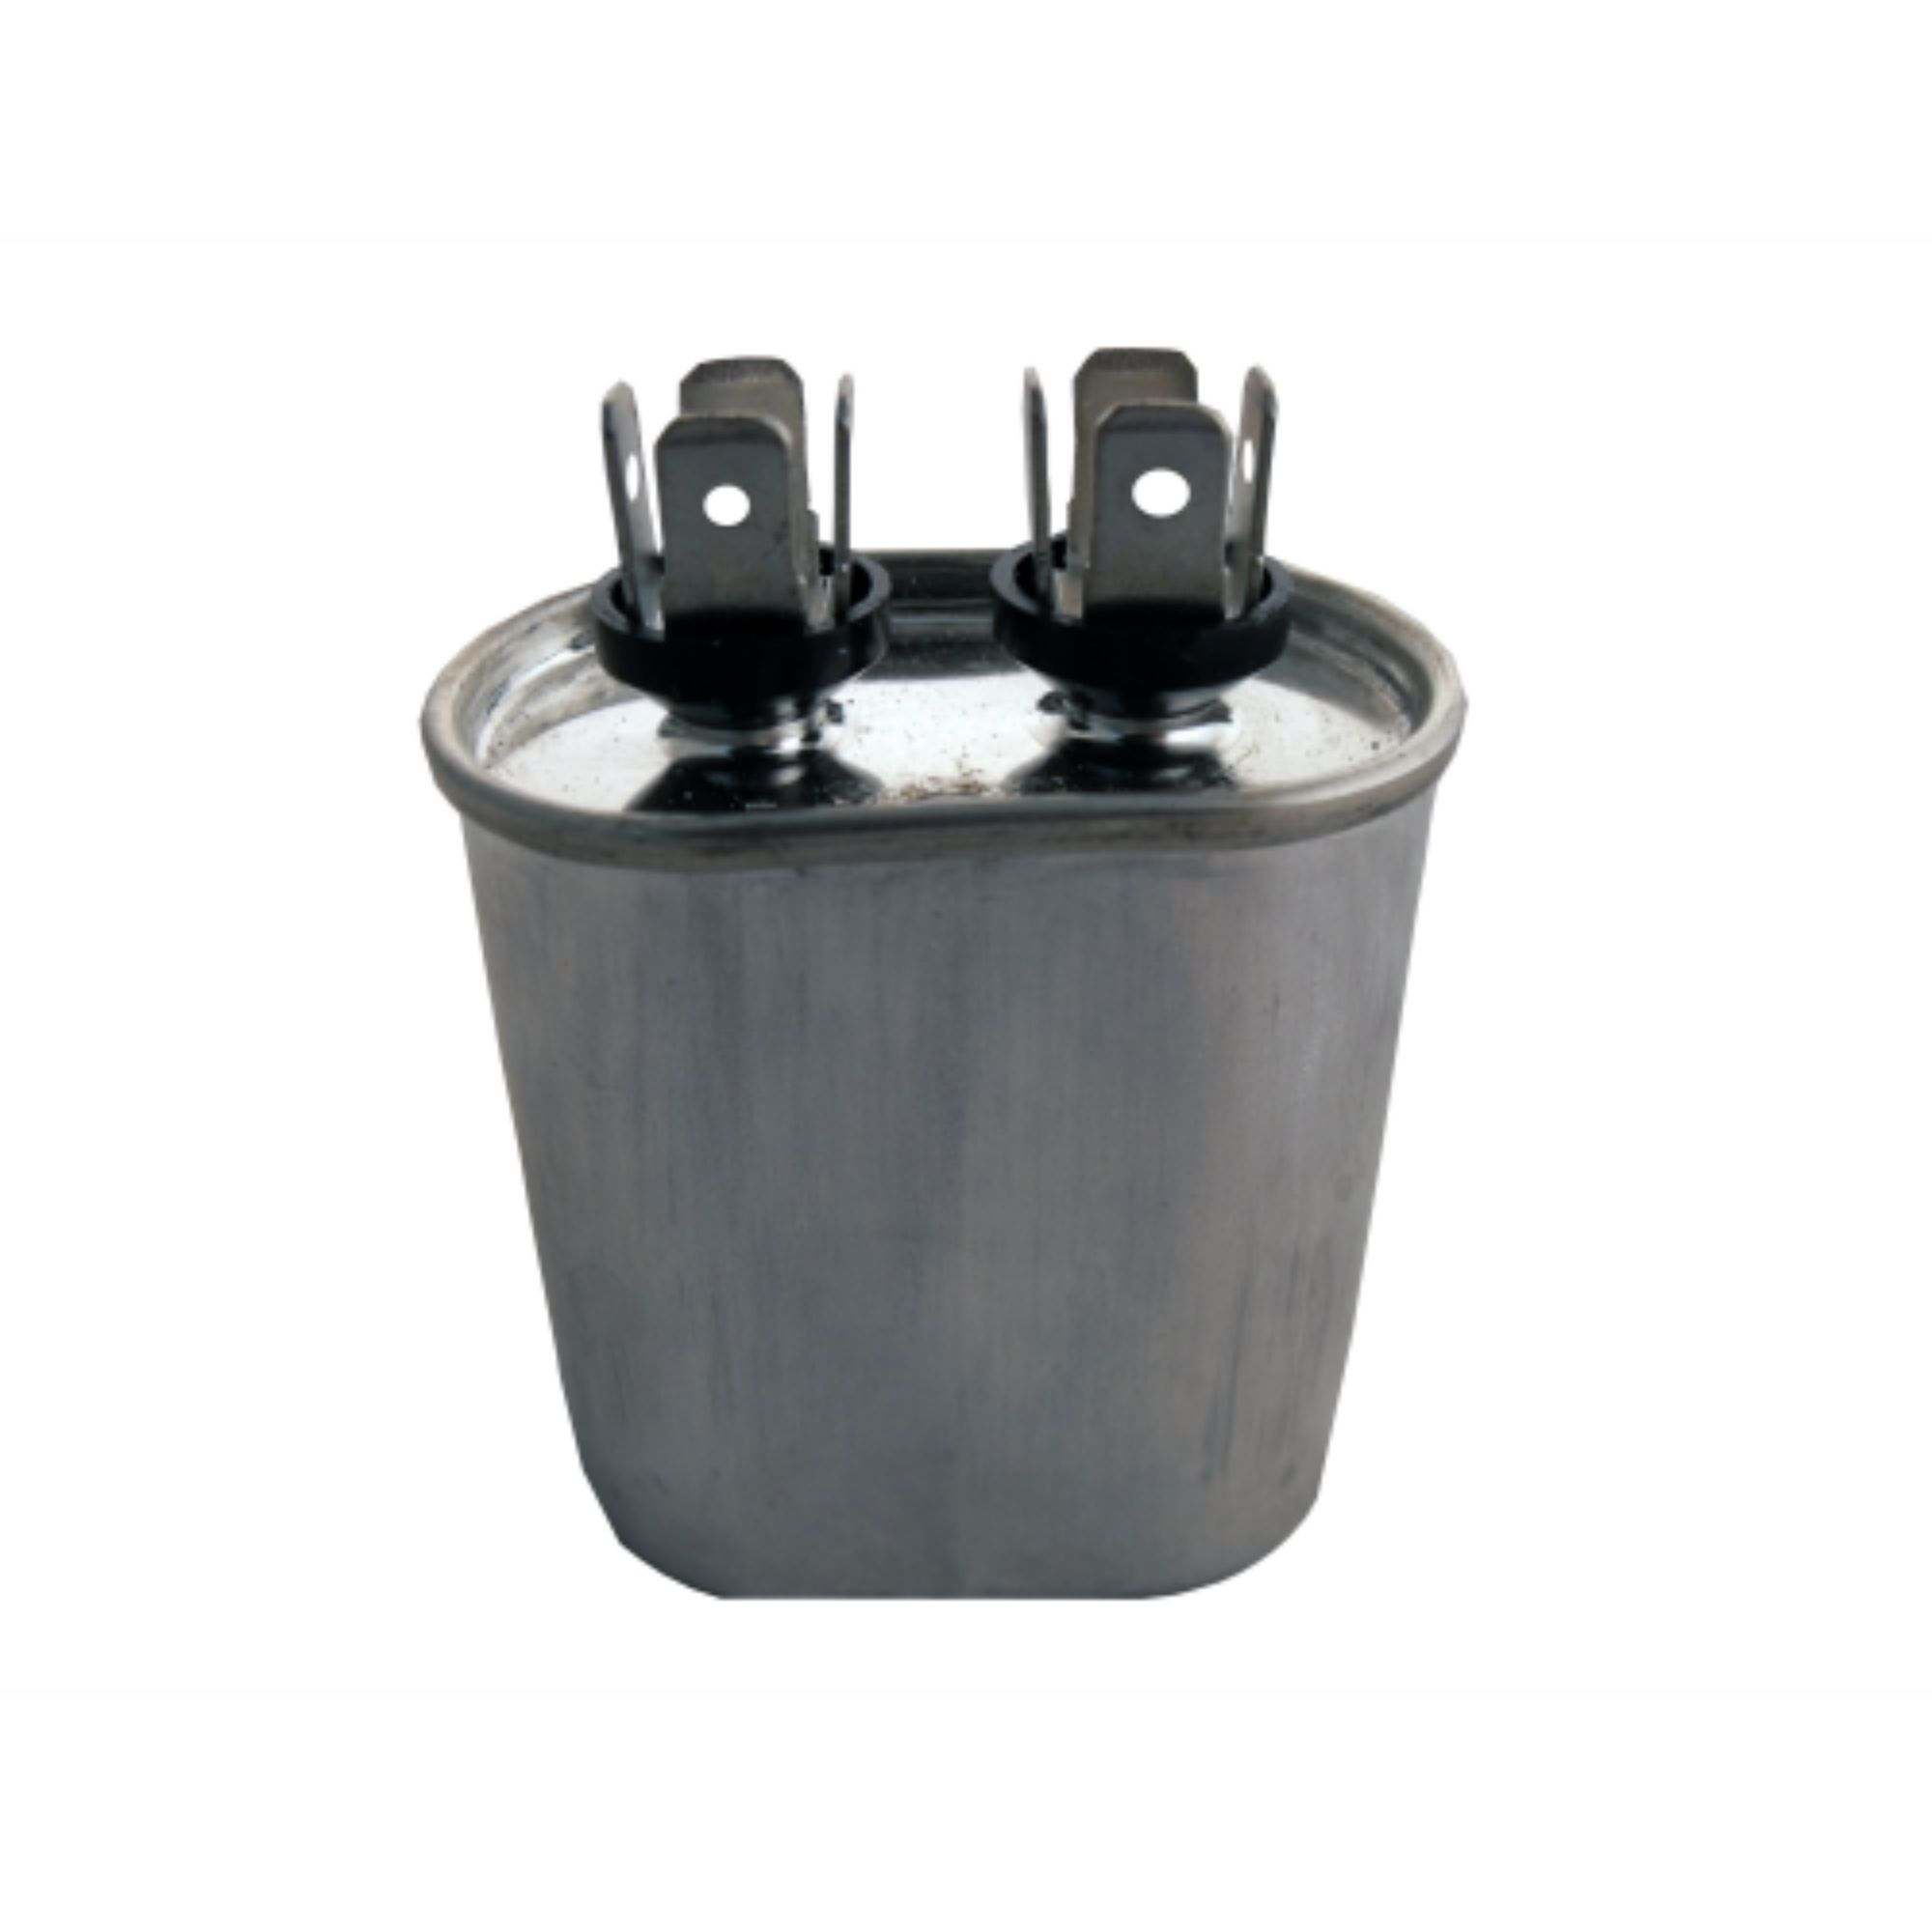 Bryant Furnace: Bryant Furnace Blower Capacitor